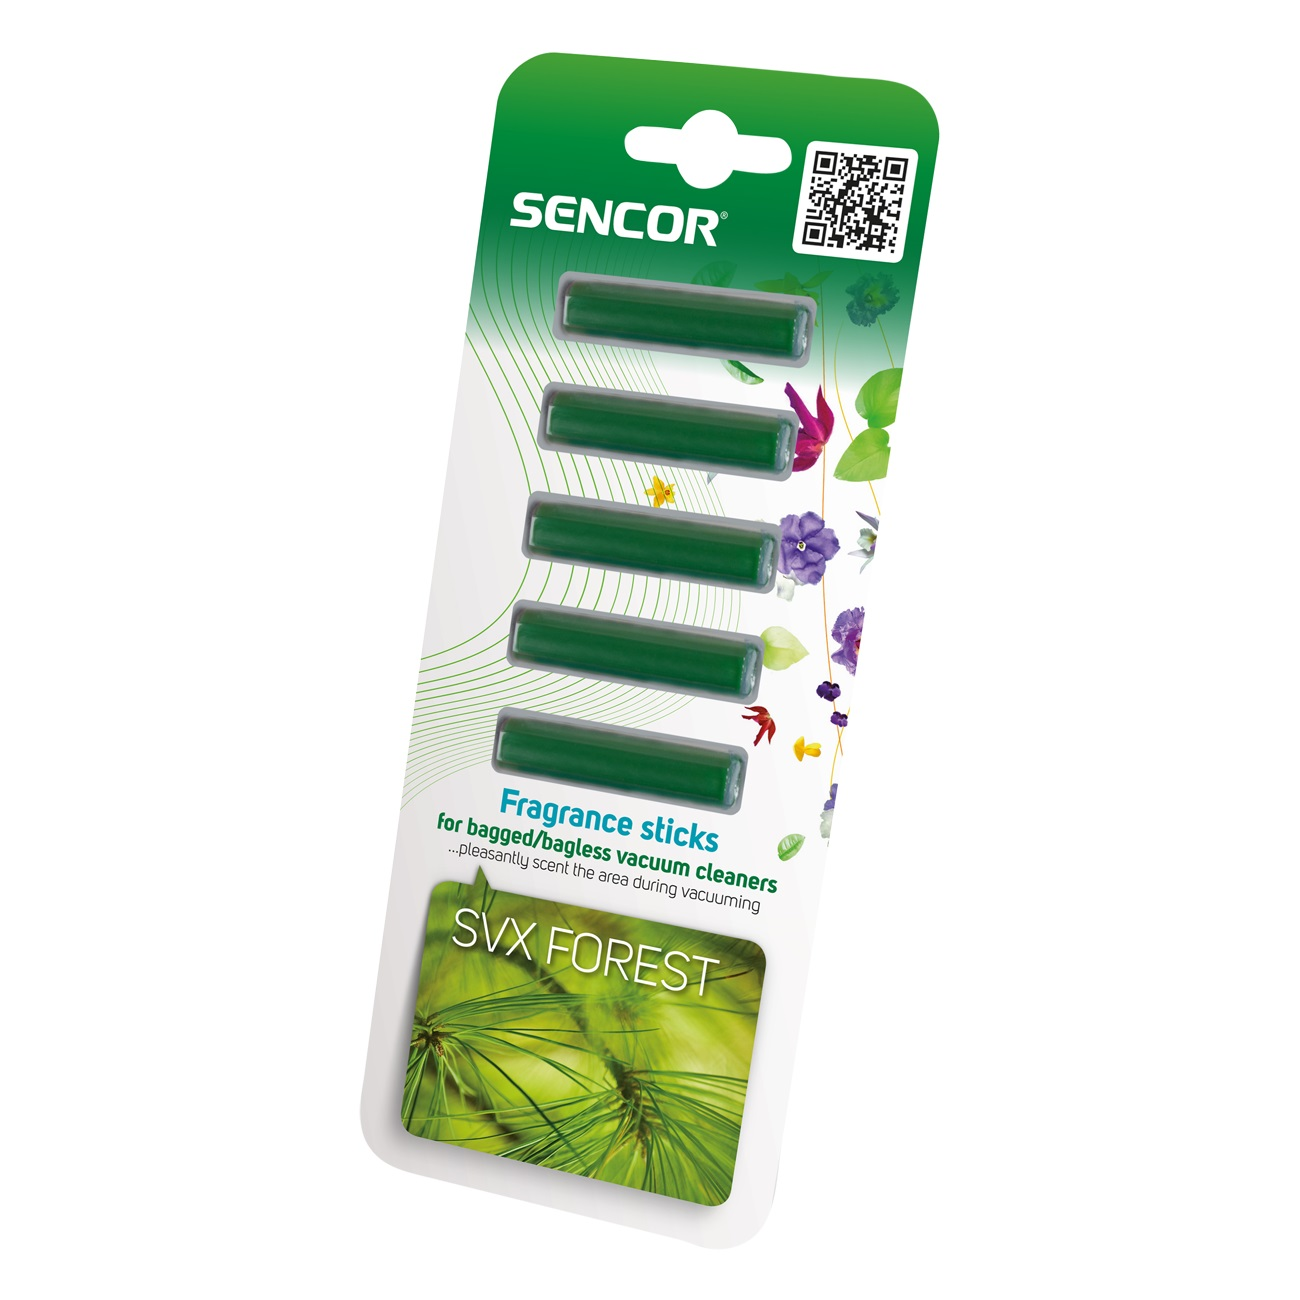 Imurin tuoksutikku Sencor SVXForest-0